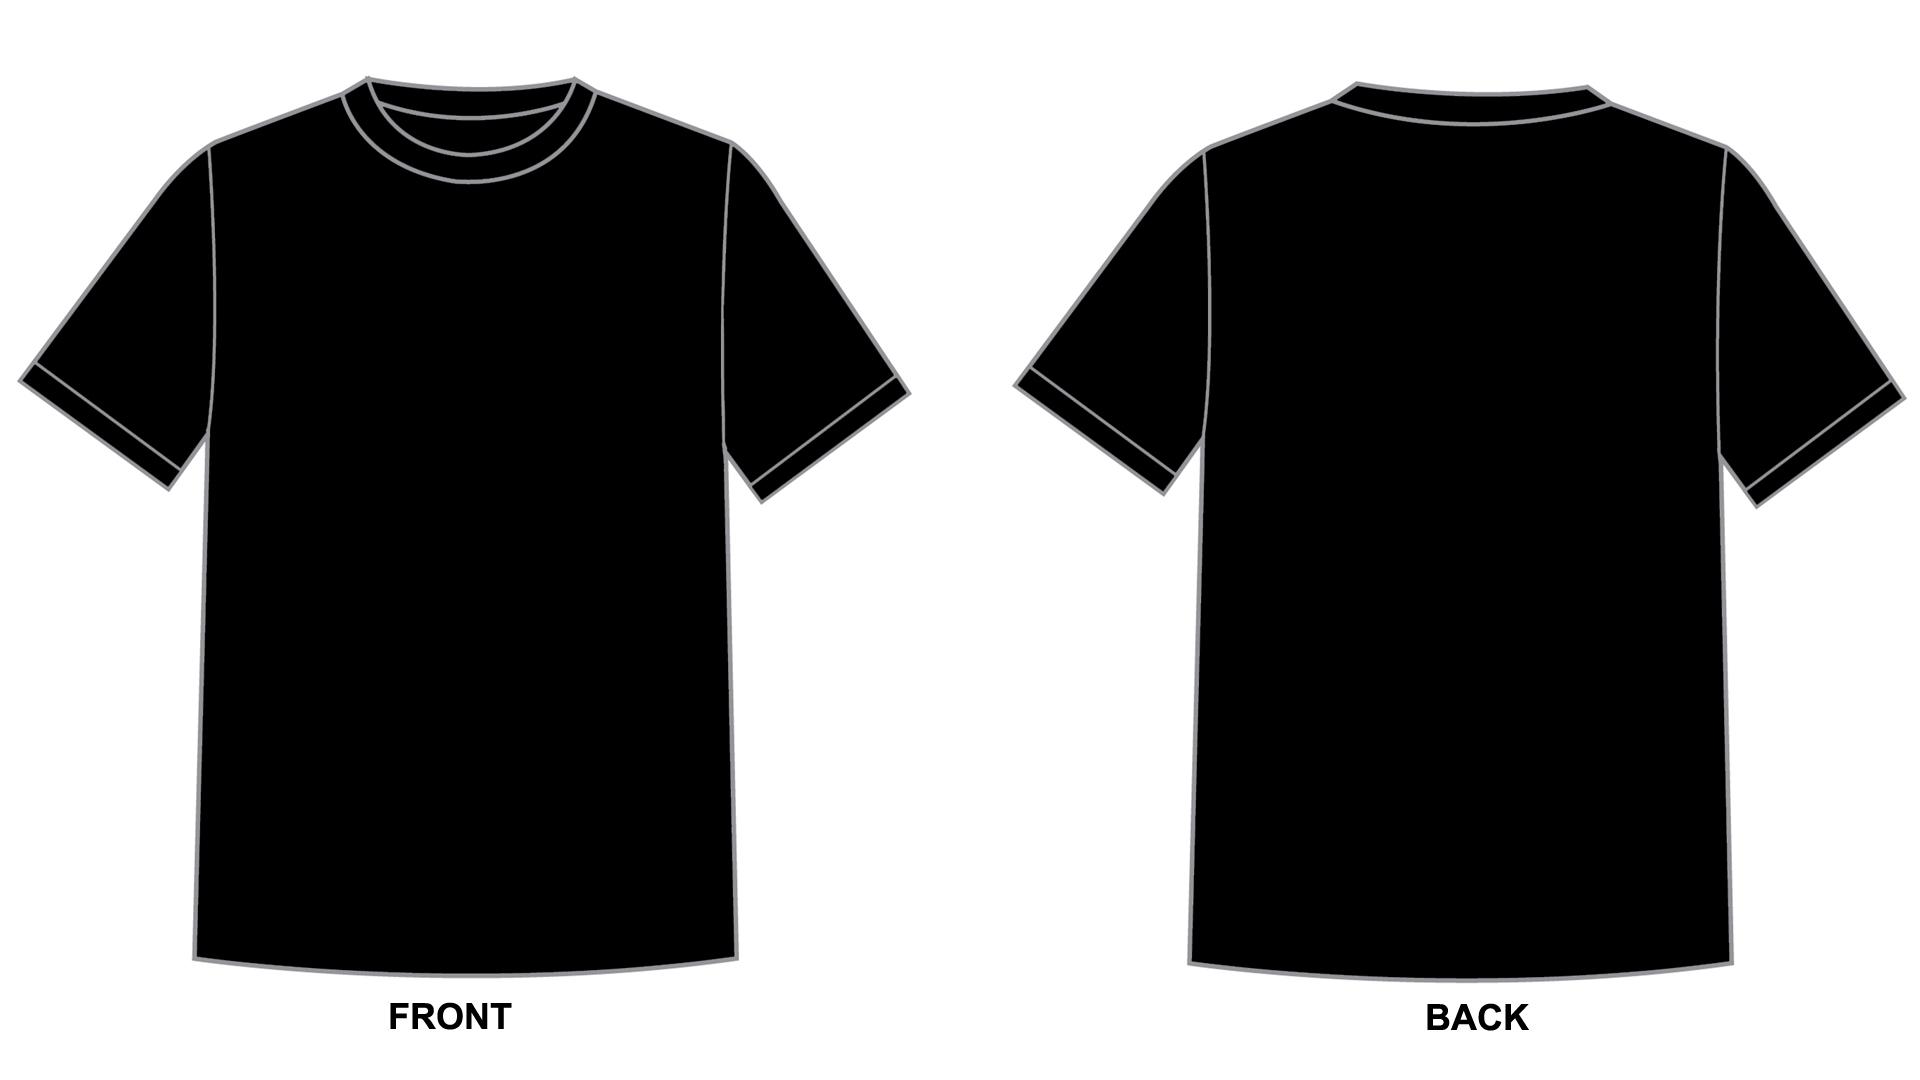 blank tshirt template black in 1080p hd wallpapers. Black Bedroom Furniture Sets. Home Design Ideas